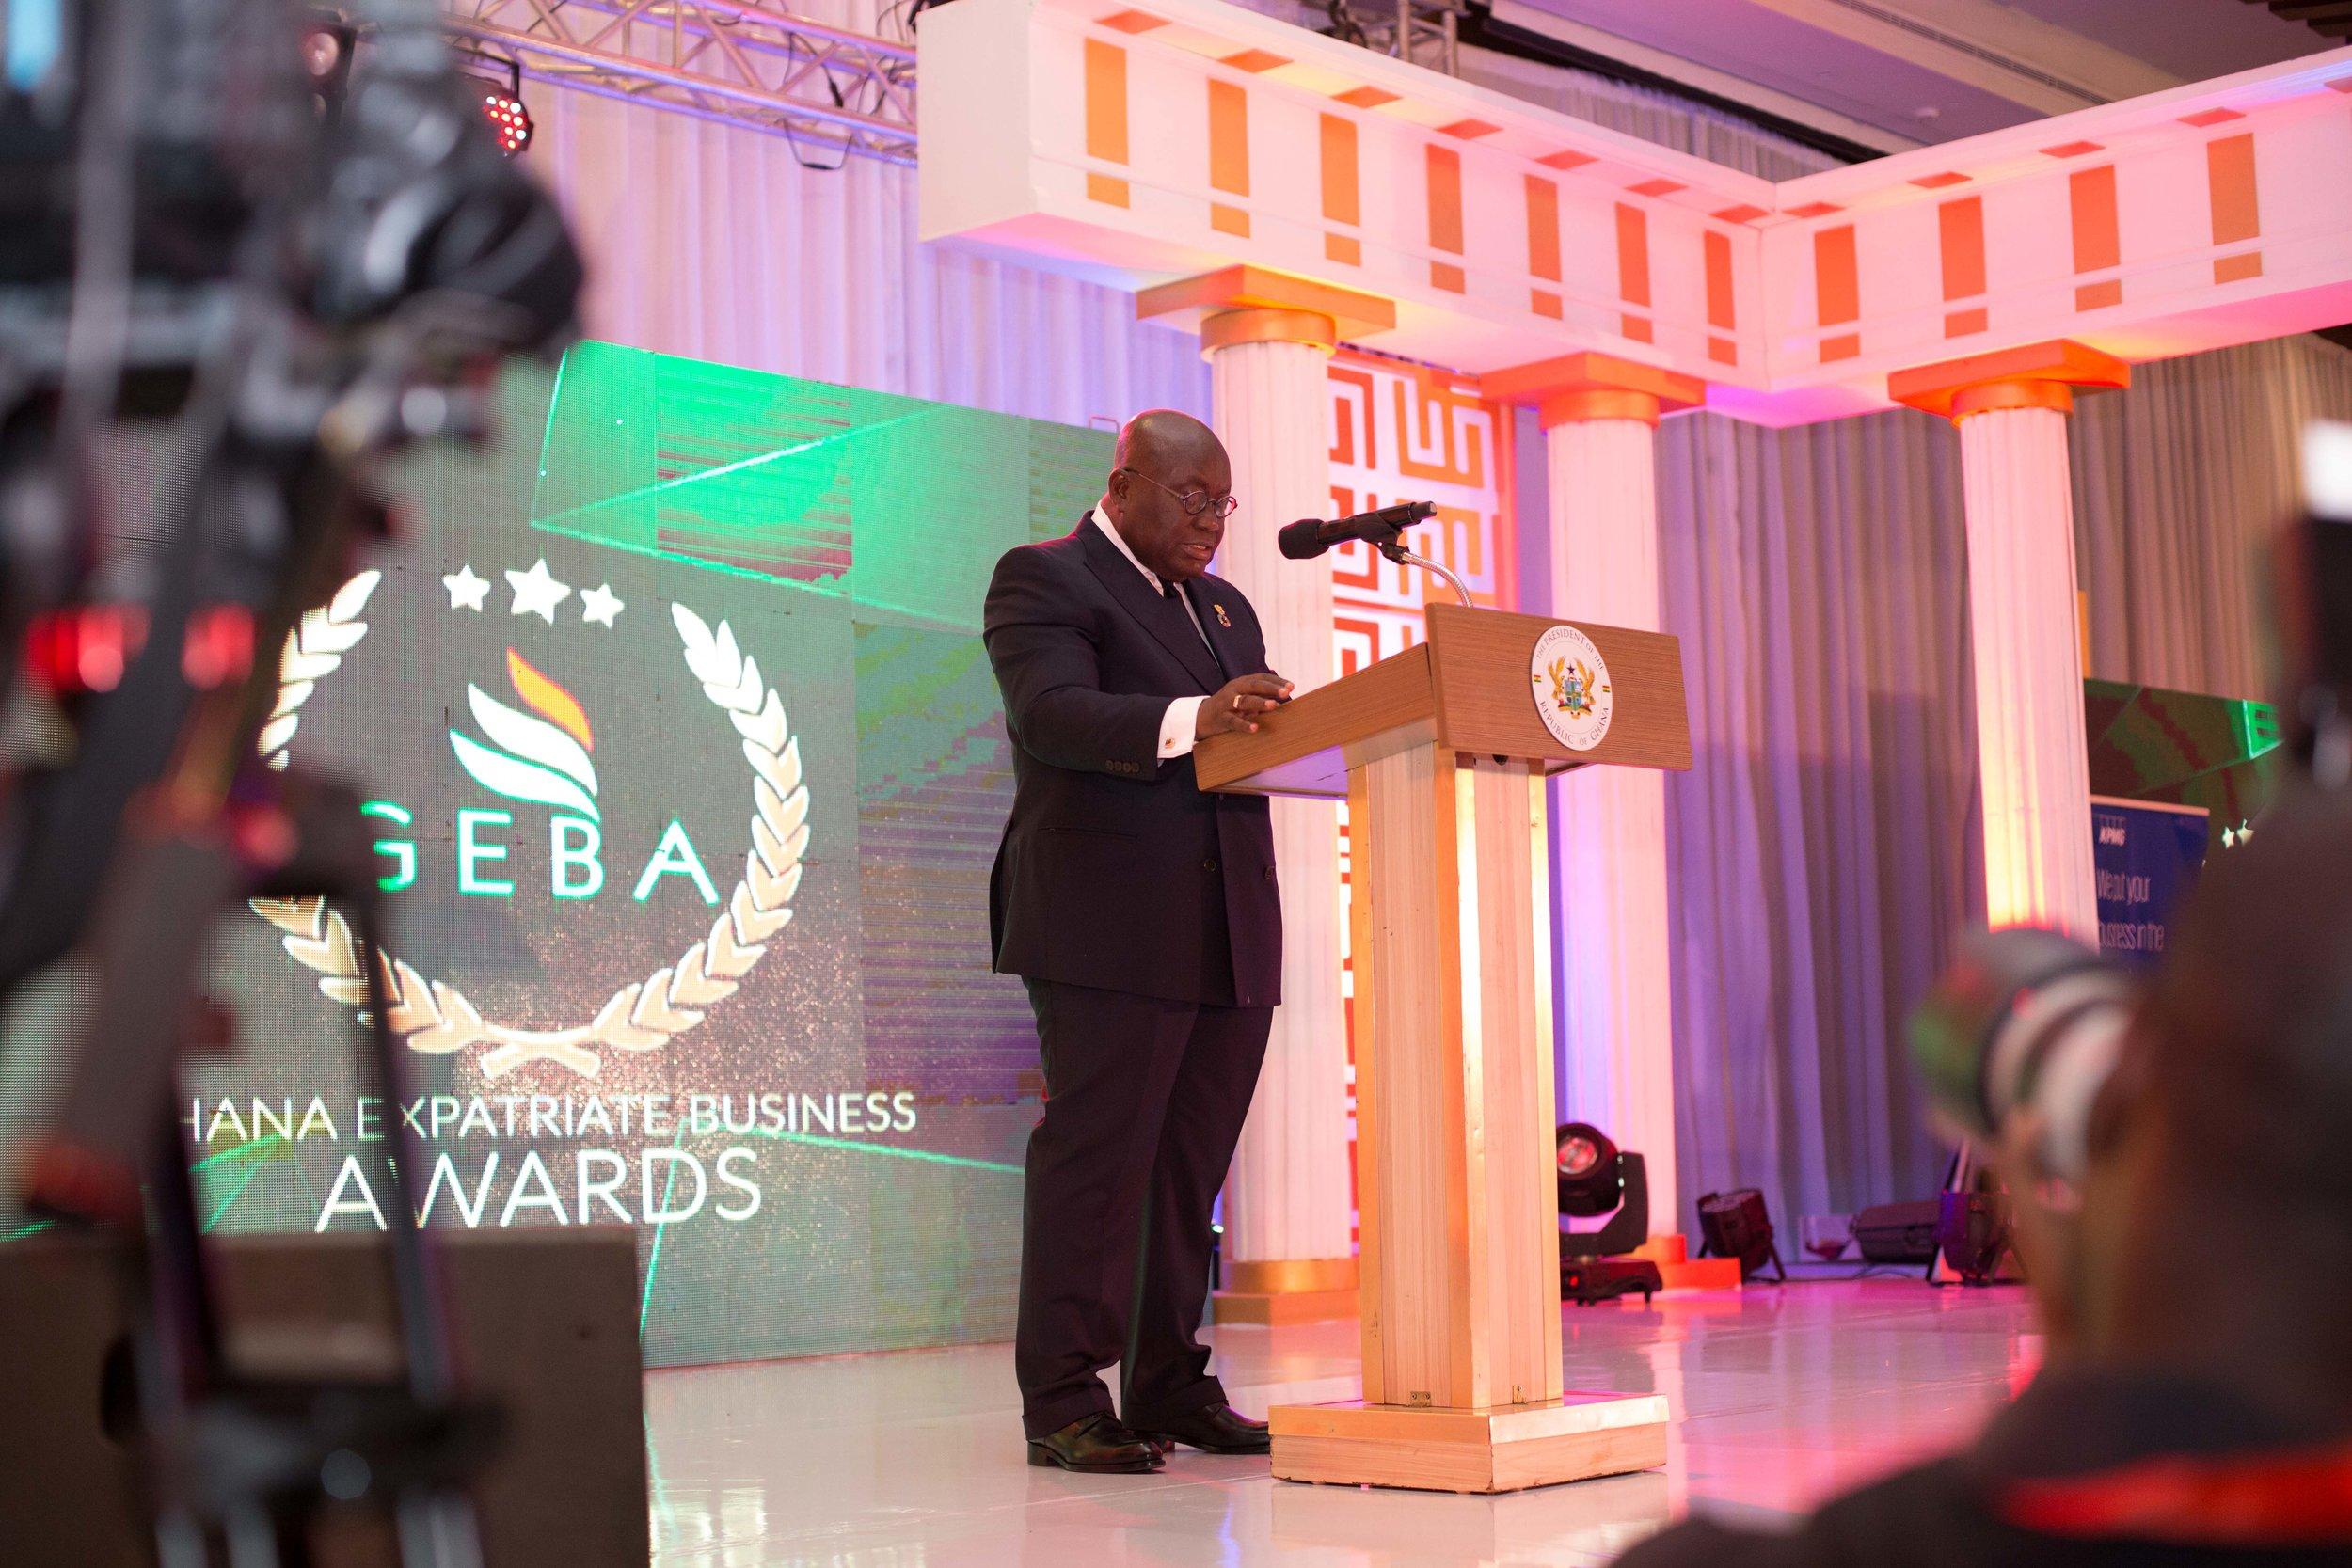 Keynote speaker His Excellency Nana Addo Dankwa Akufo-Addo